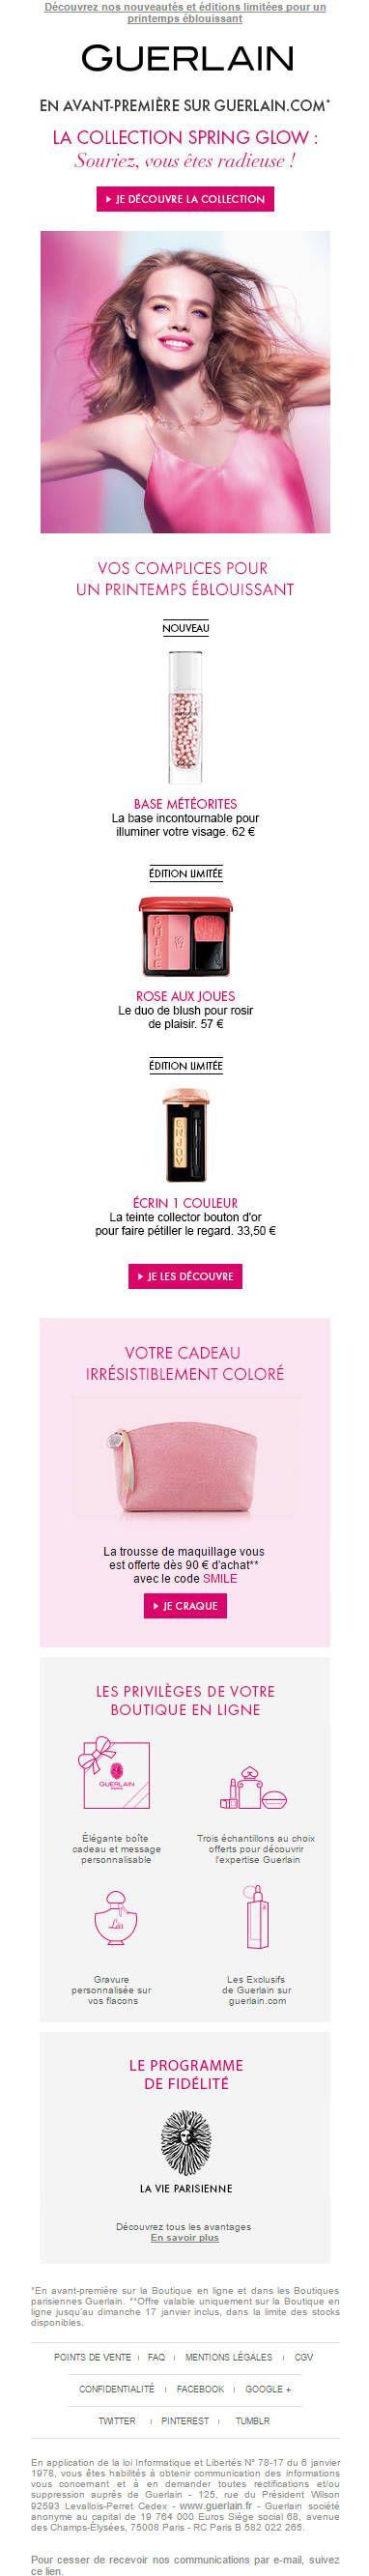 Guerlain - Email nouvelle collection